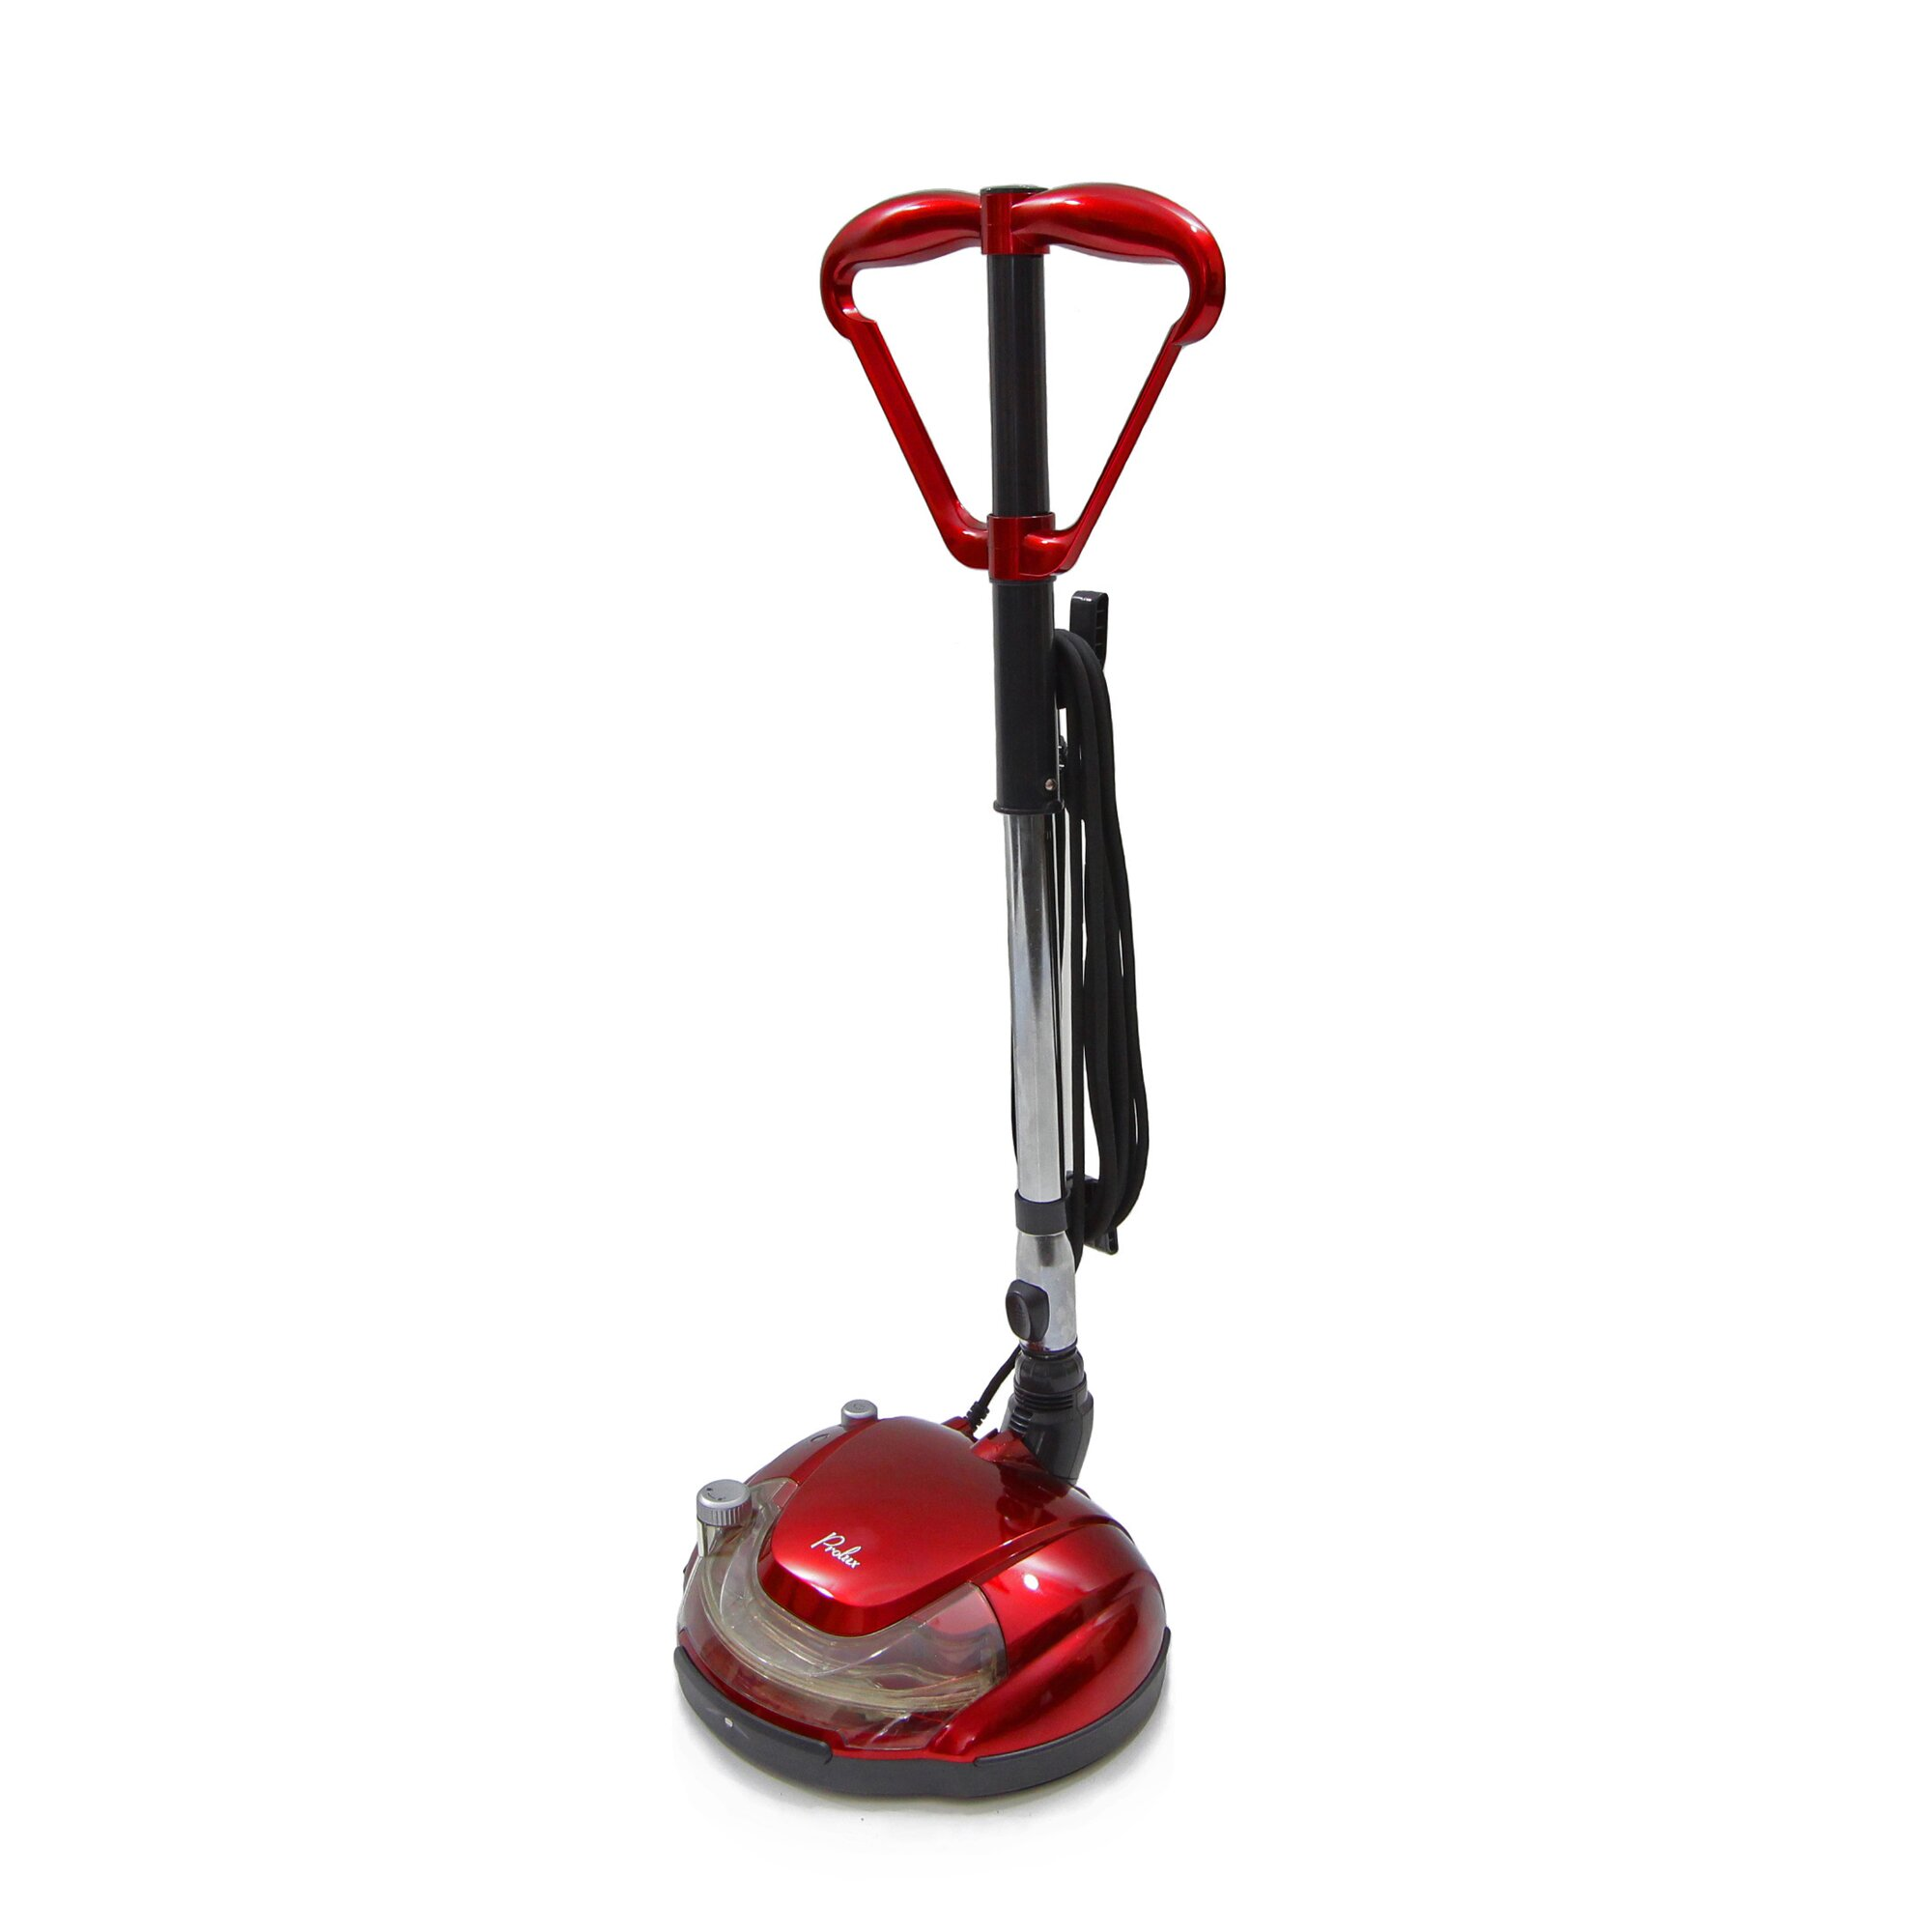 Hardwood Floor Scrubber hardwood floor cleaning maintenance restoring the radiance Hard Floor Cleaner Polisher Buffer Hardwood Grout Tile Scrubber Waxer Floor Mop